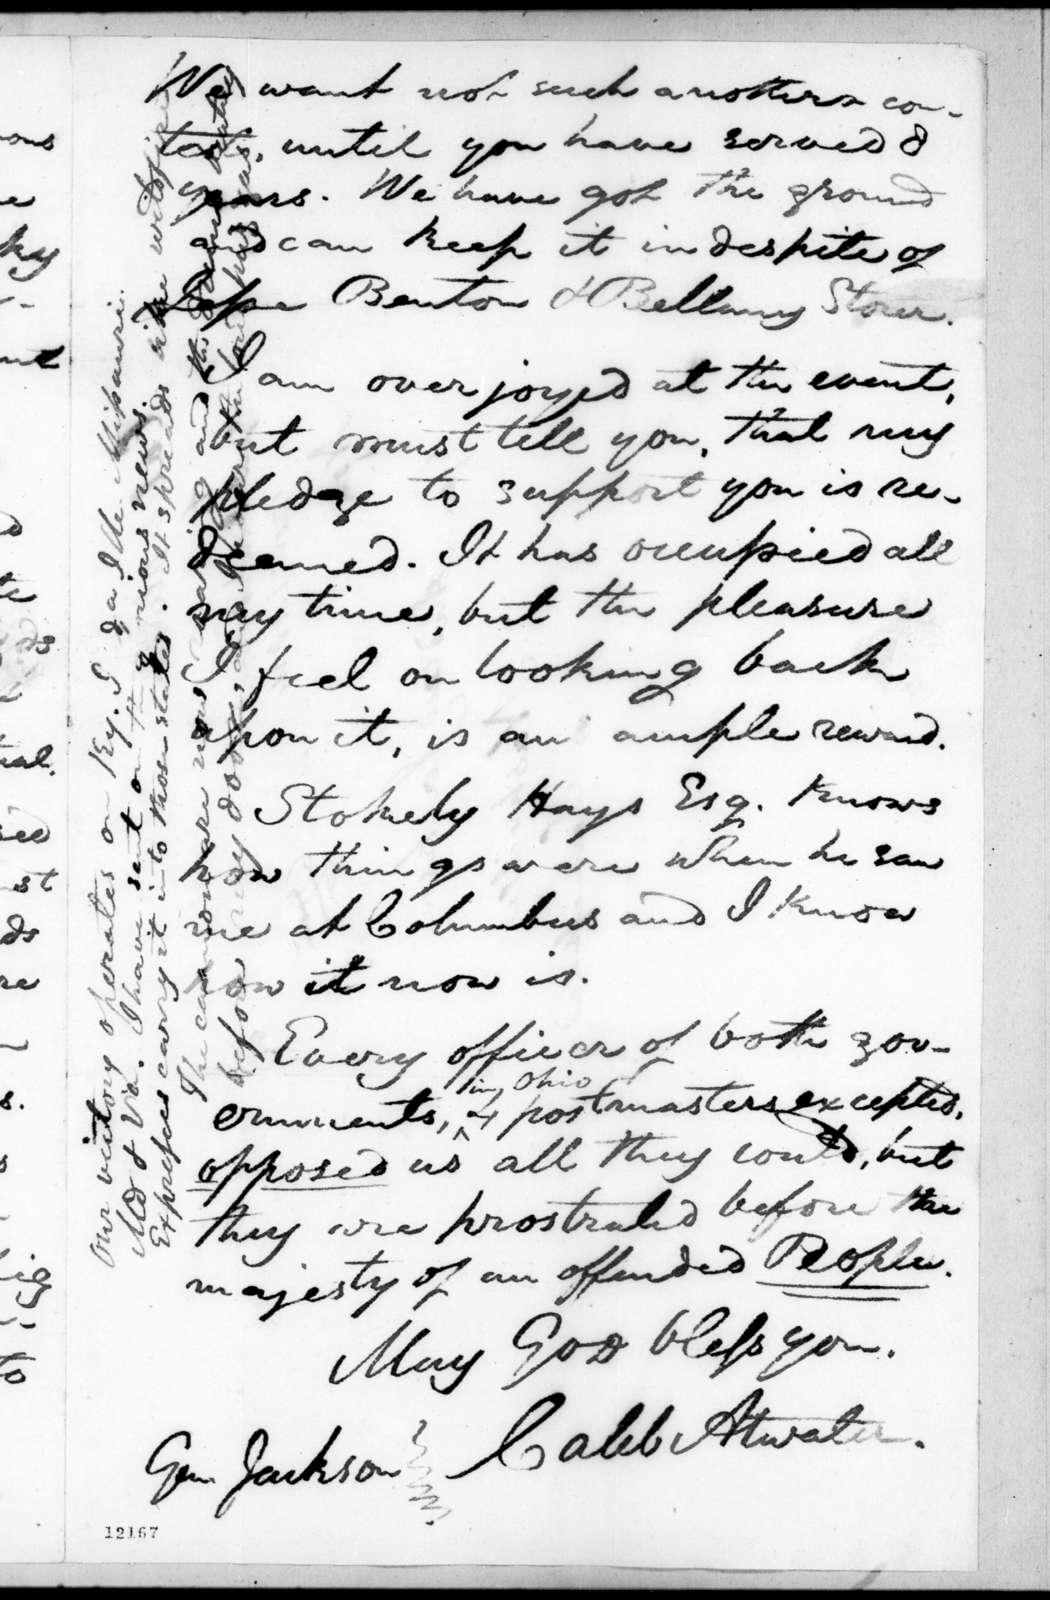 Caleb Atwater to Andrew Jackson, November 1, 1824